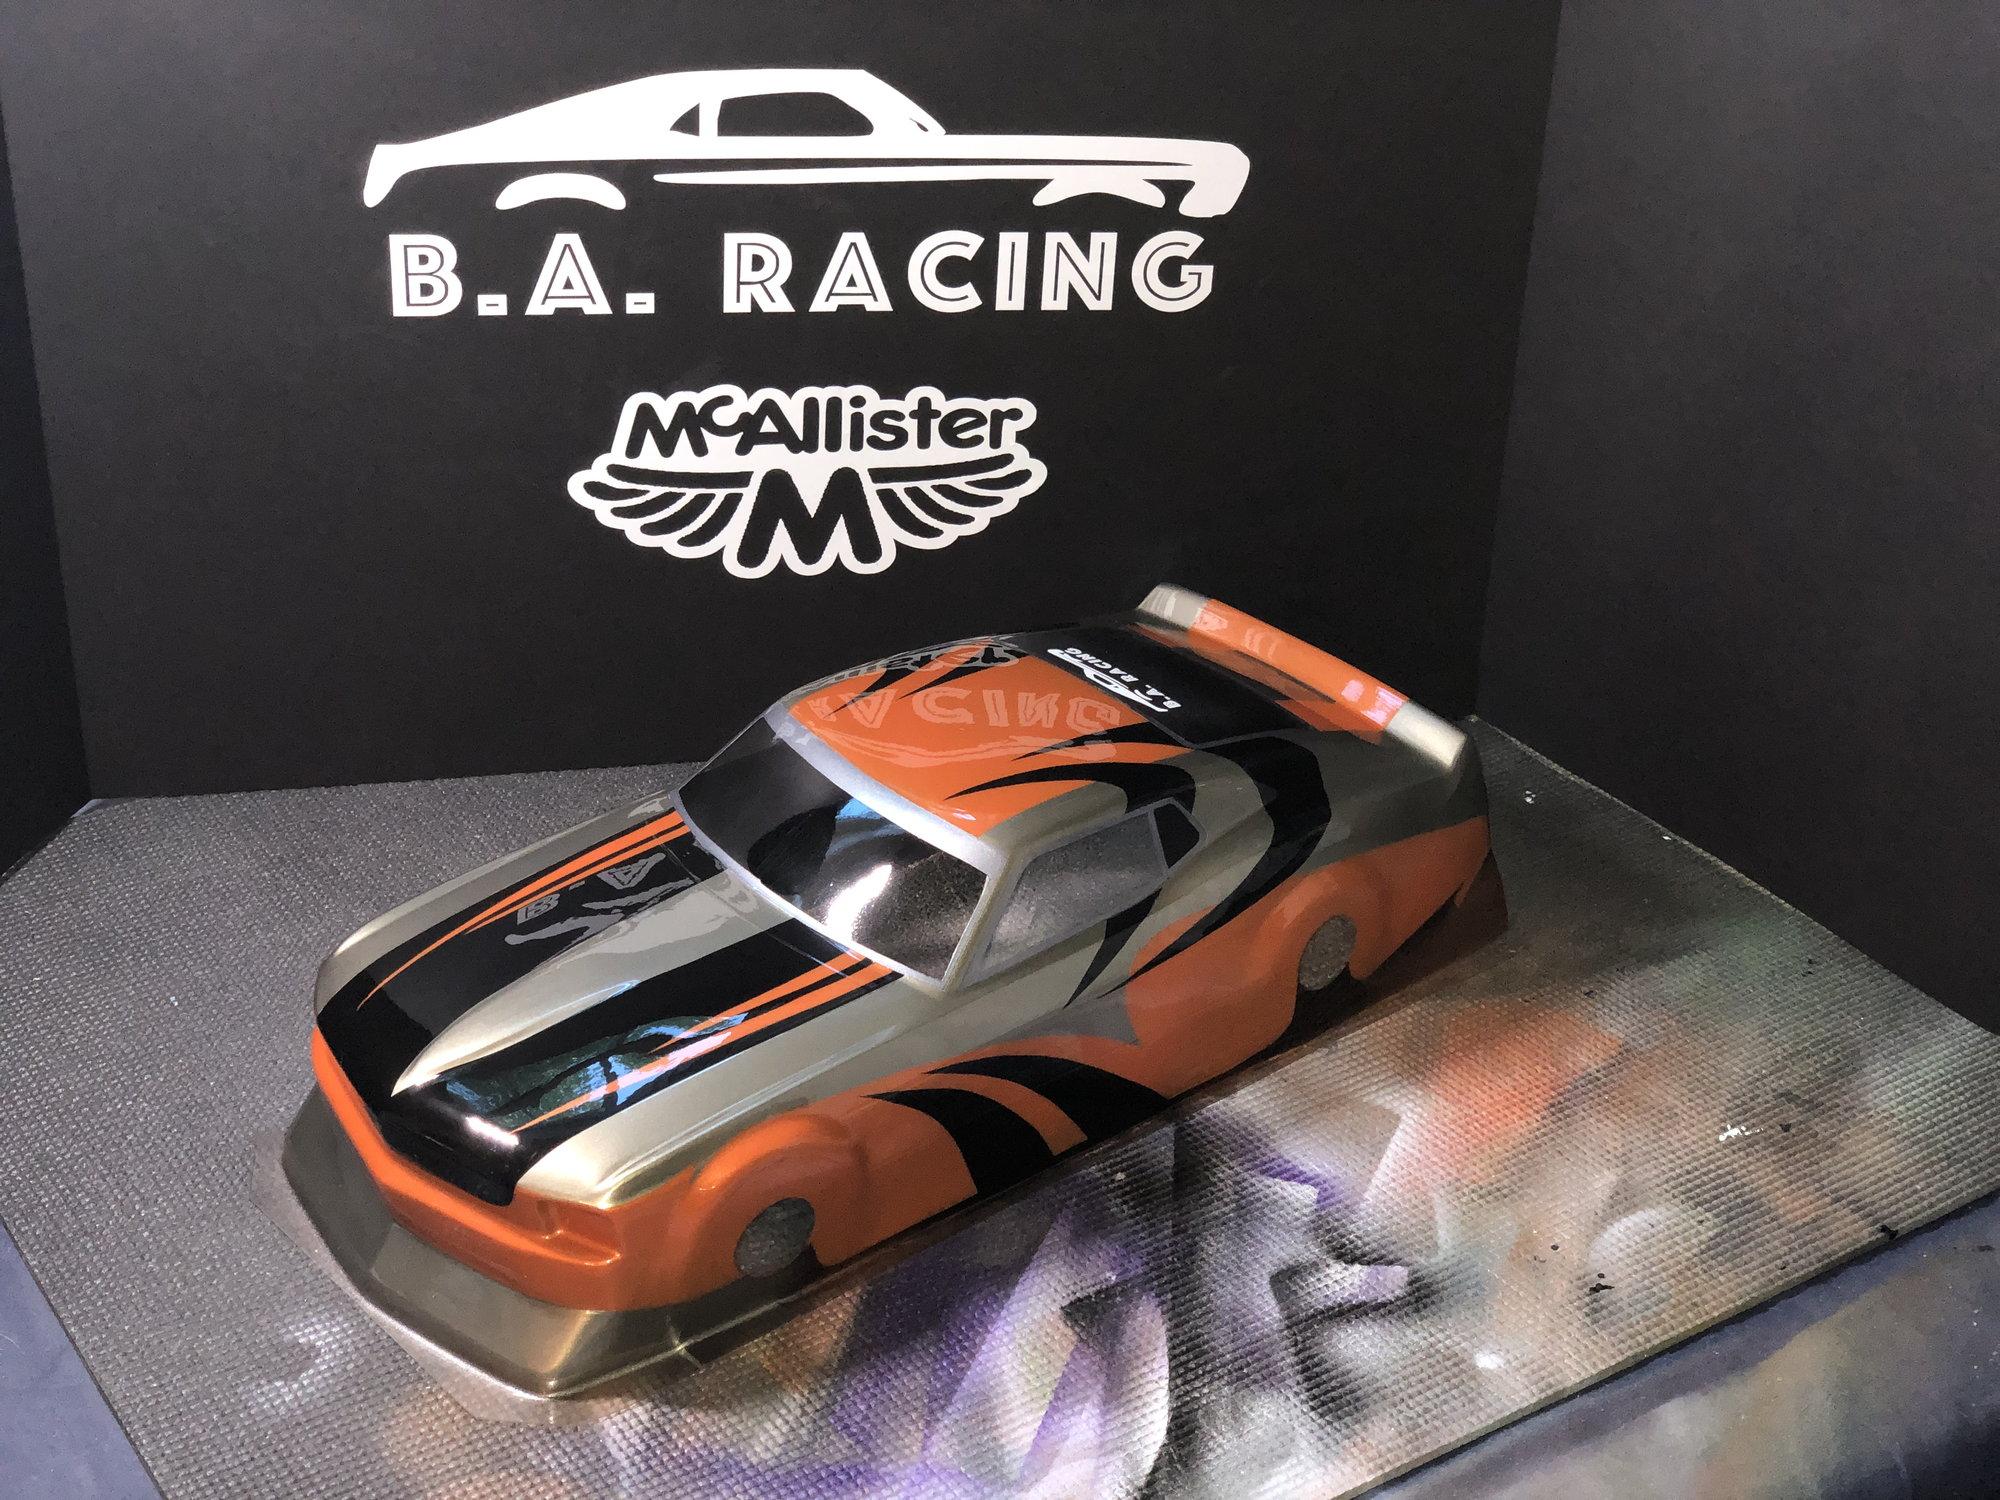 U.S. Vintage Trans-Am Racing Part 2